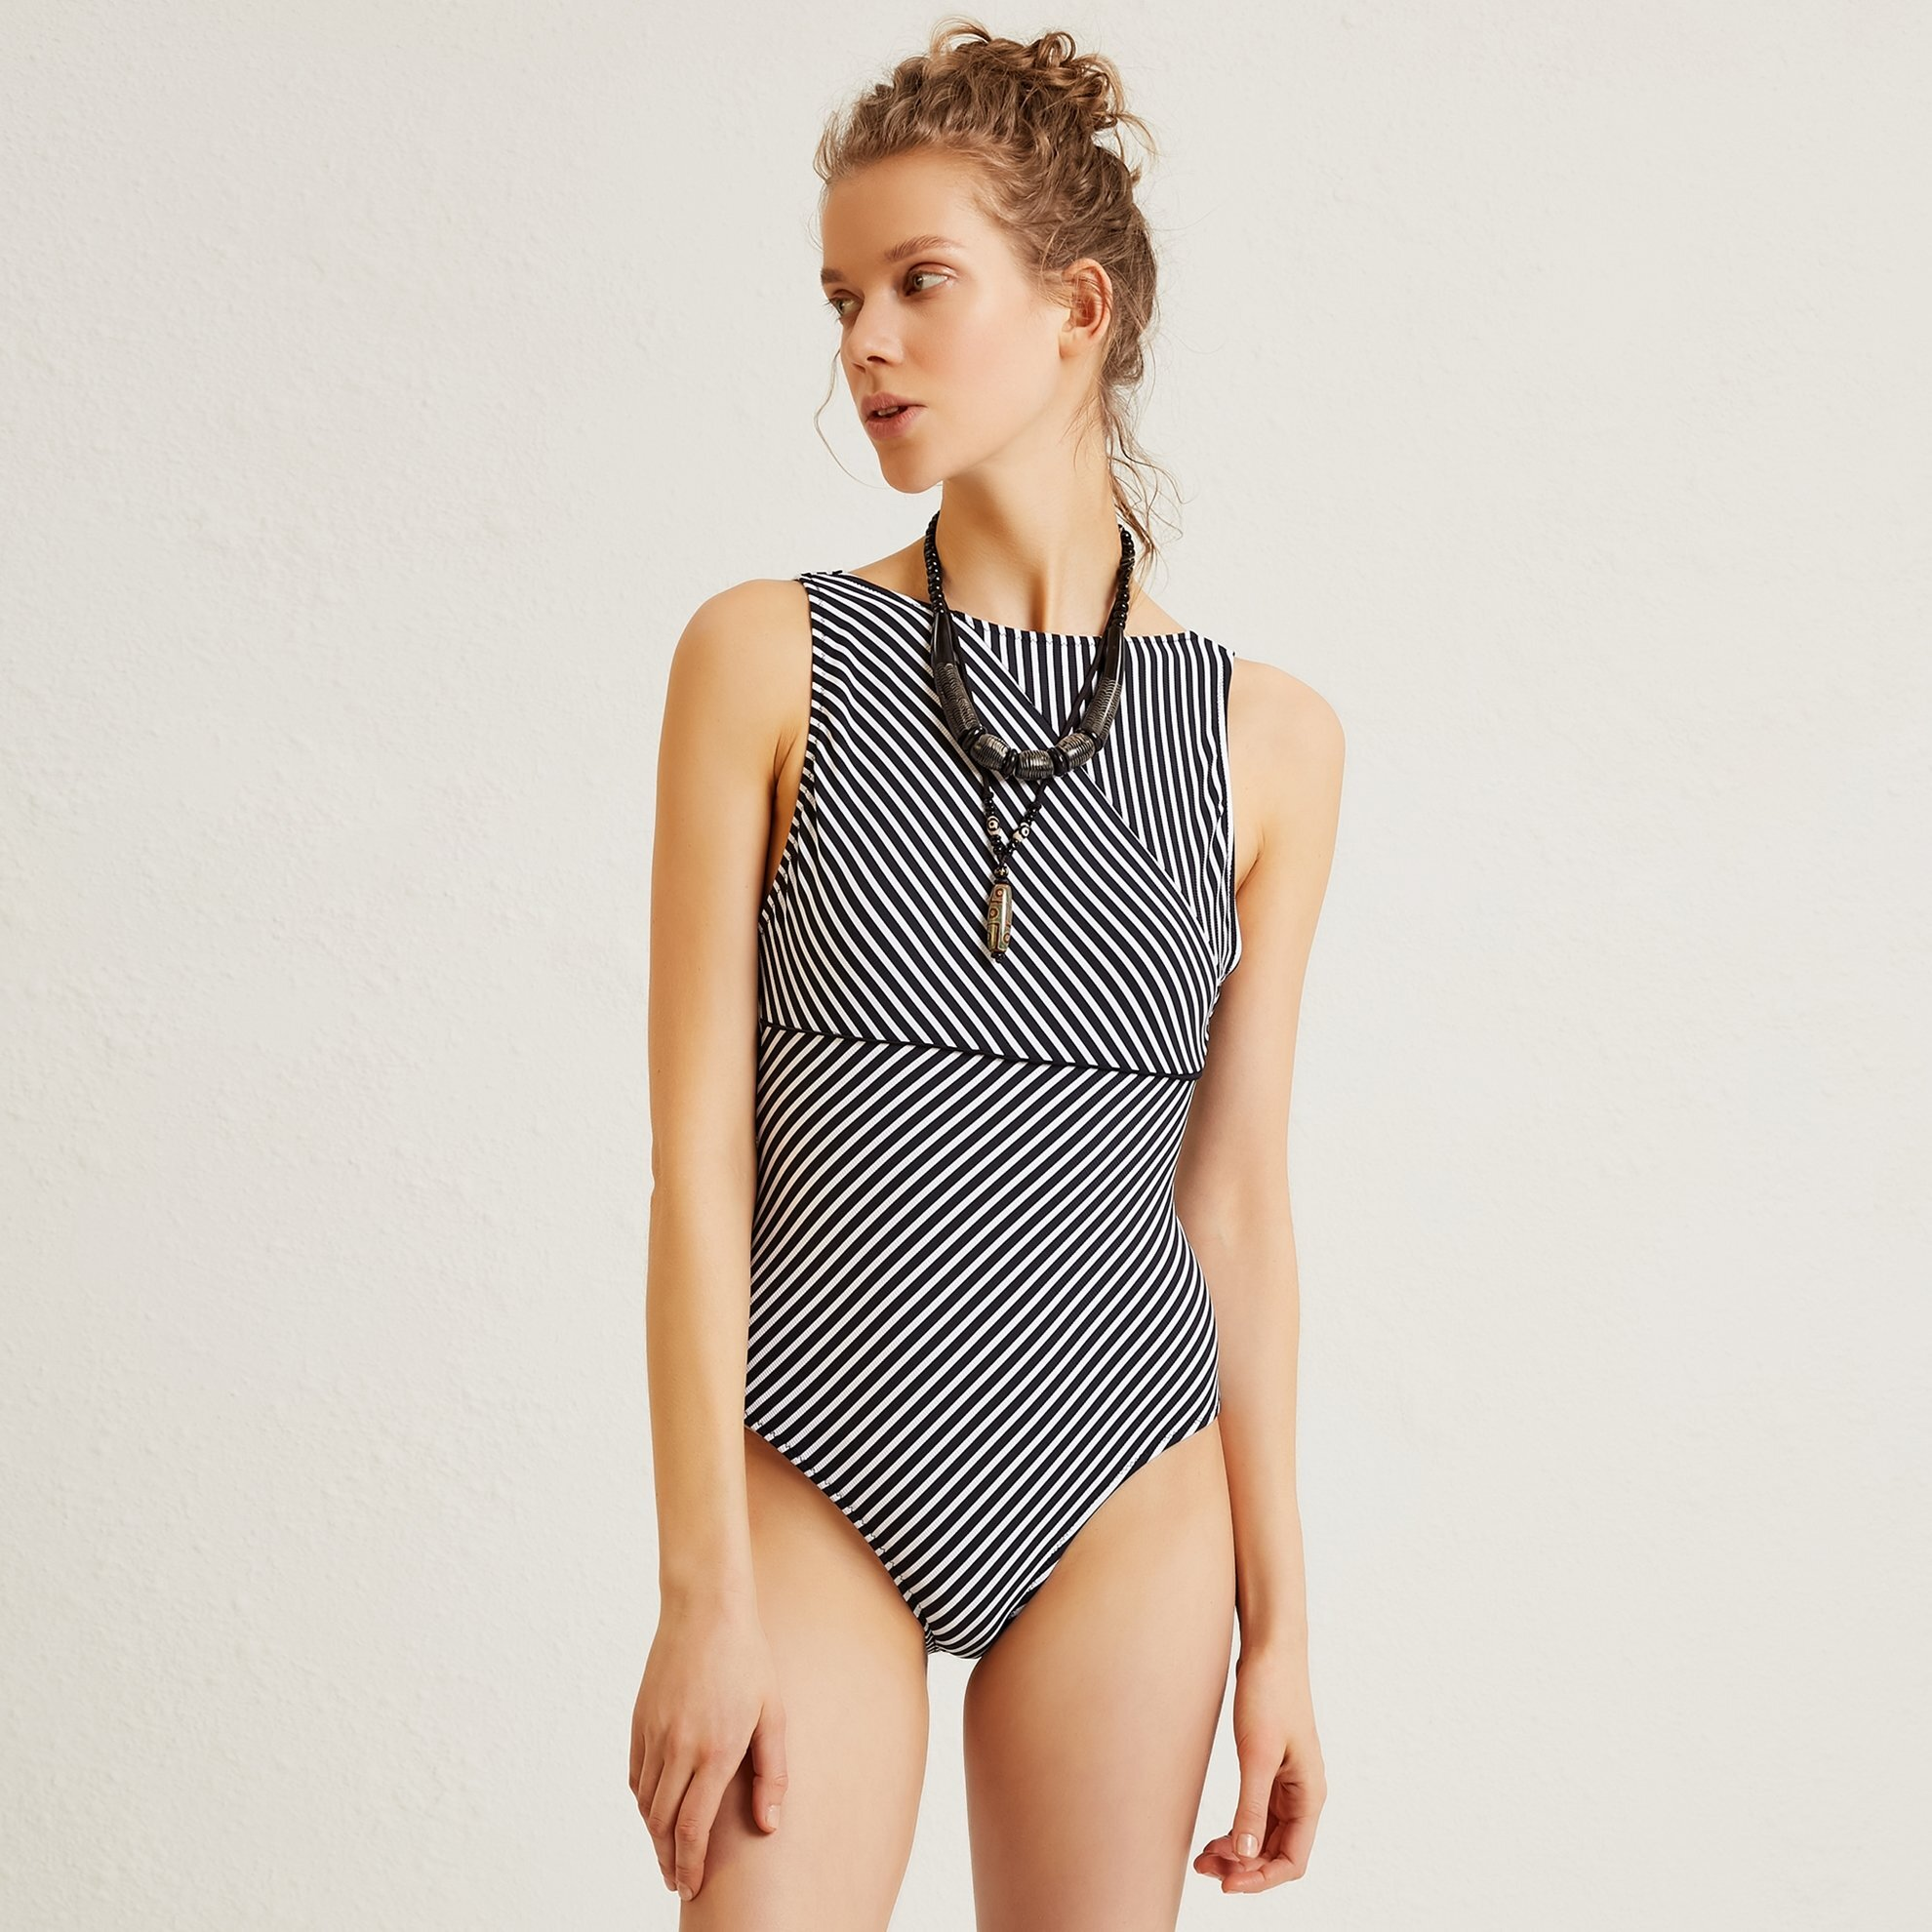 Back Detailed Swimsuit